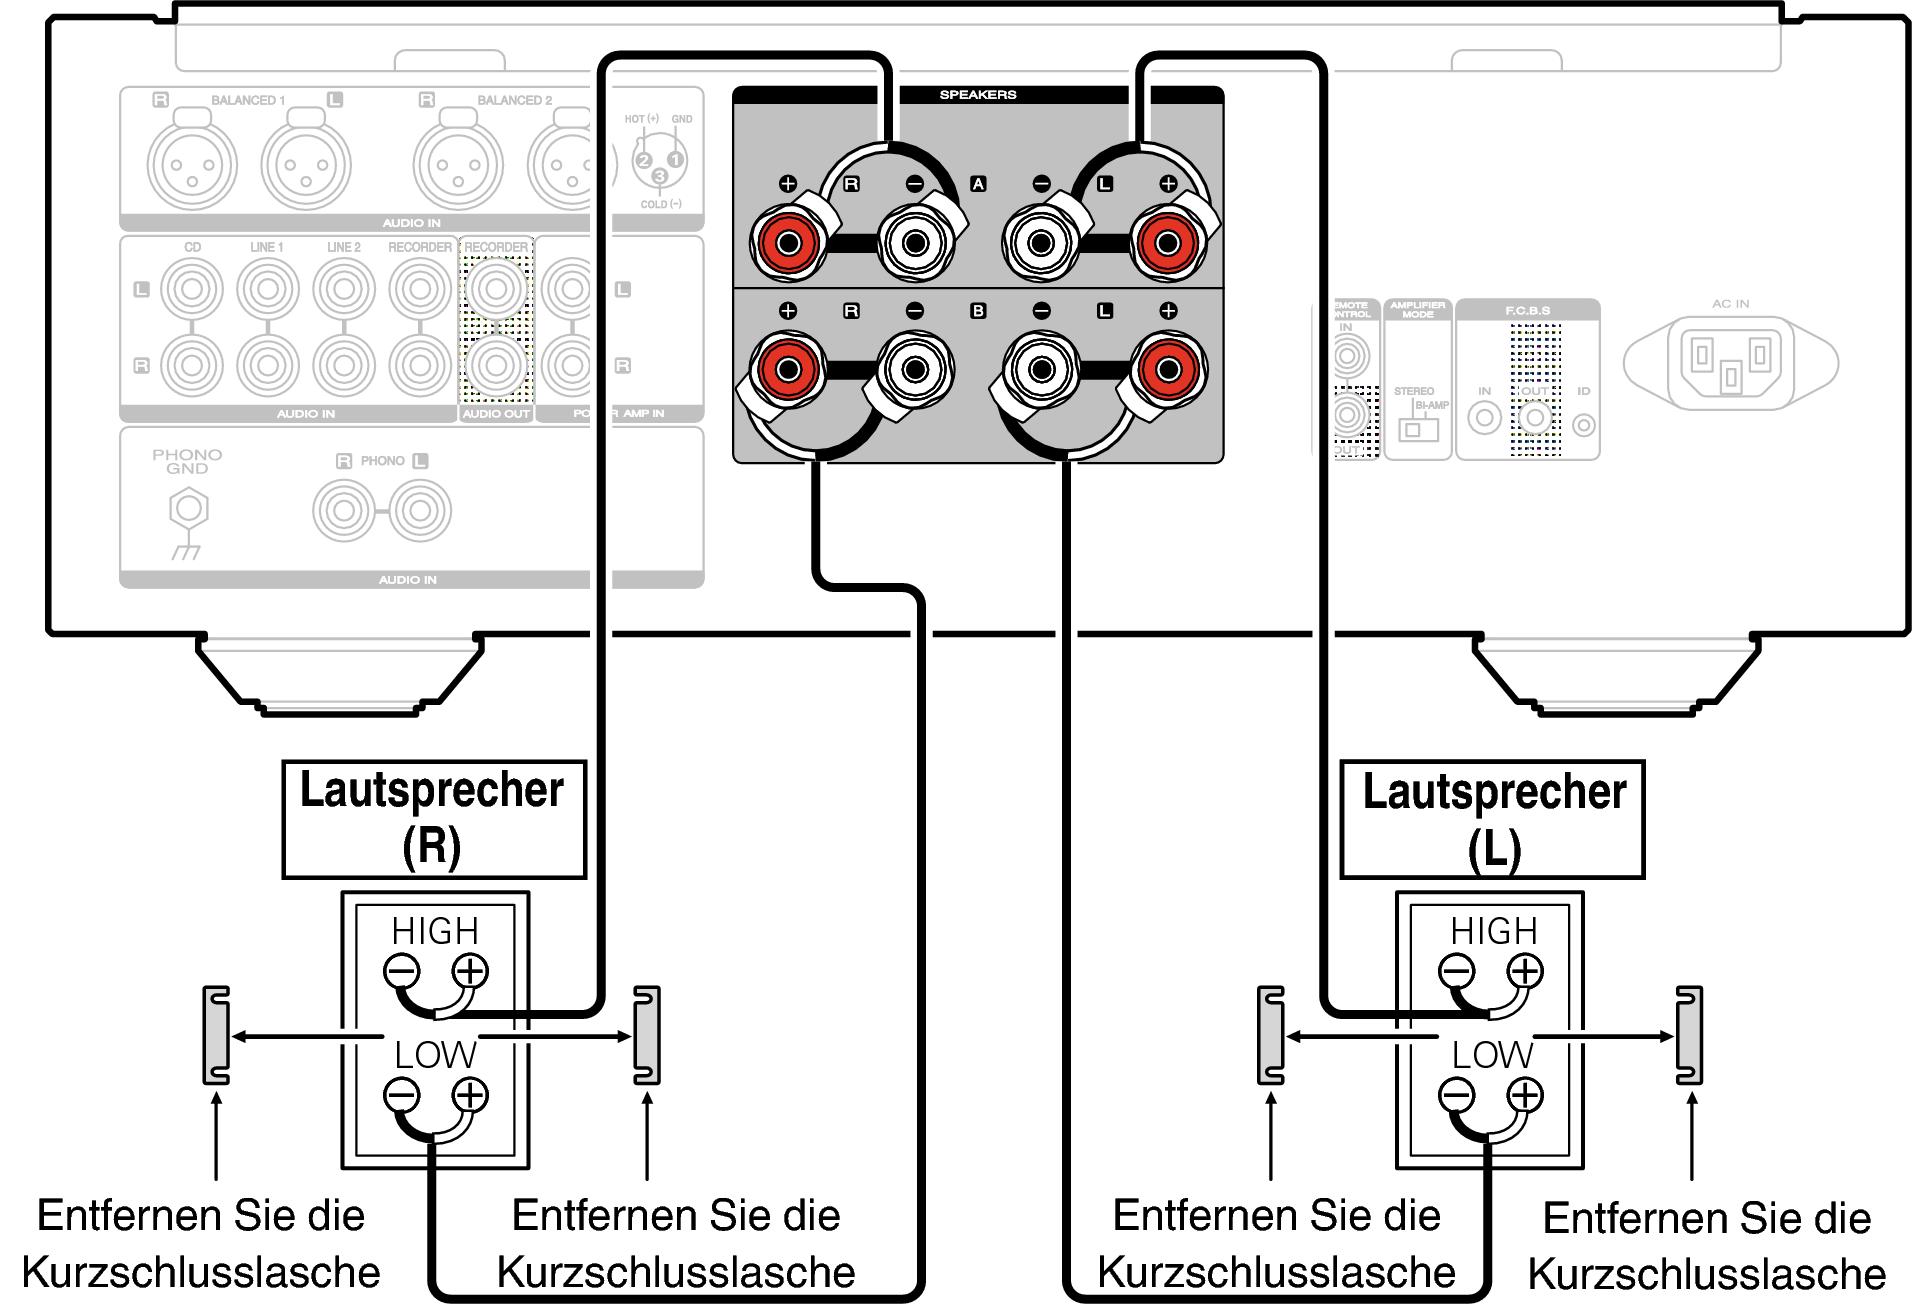 Charmant Bi Lautsprecher Diagramm Fotos - Der Schaltplan - greigo.com